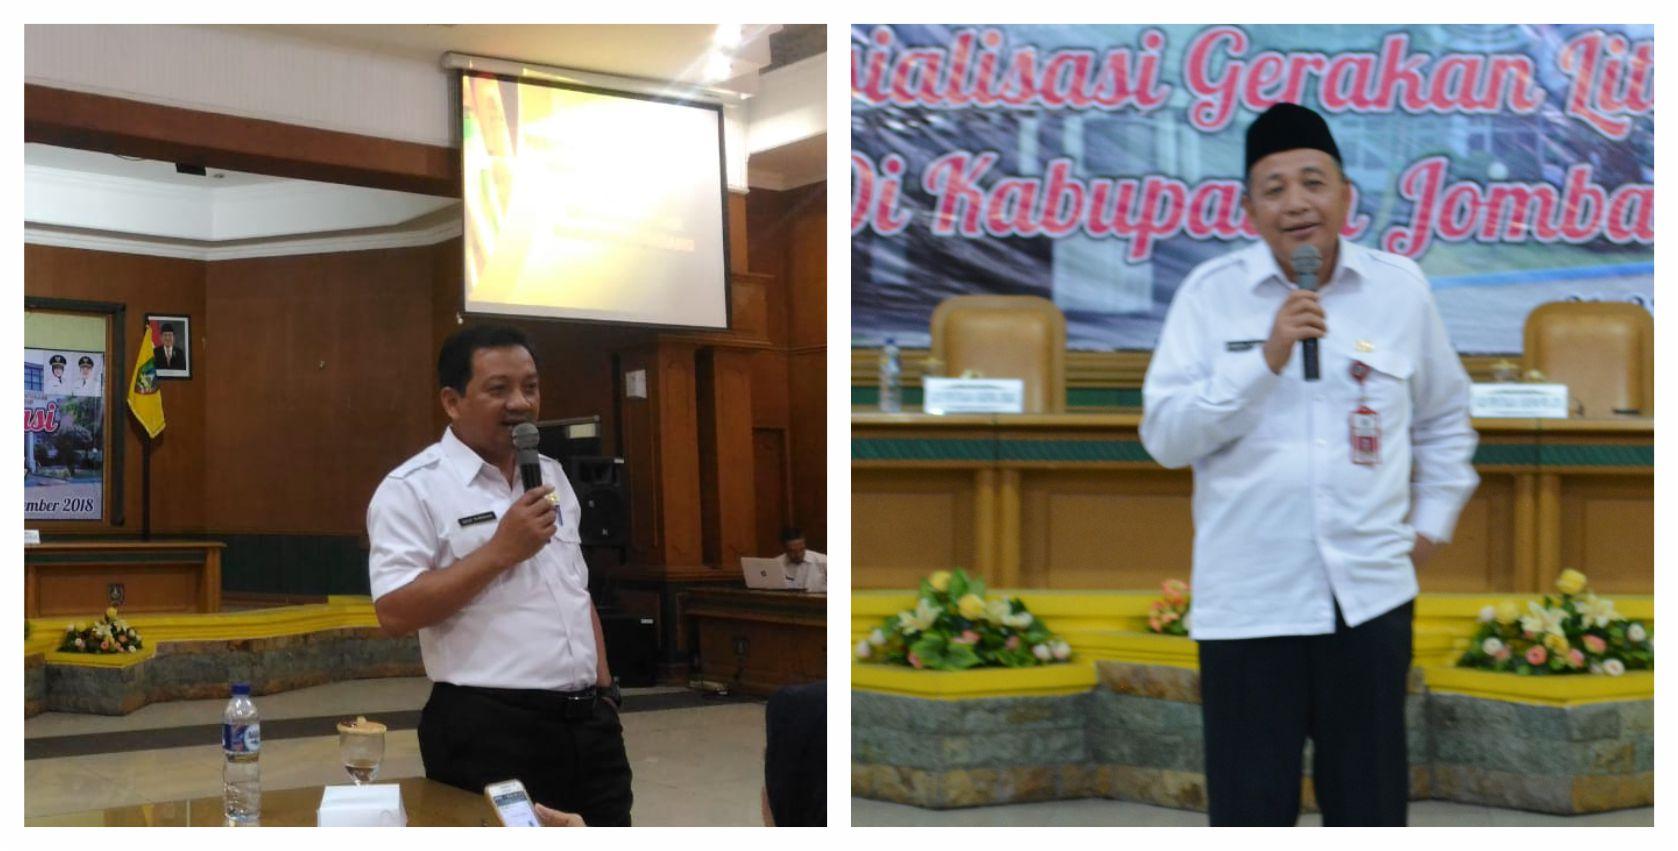 Sosialisasi Gerakan Literasi di Kabupaten Jombang tanggal 21 Nopember 2018